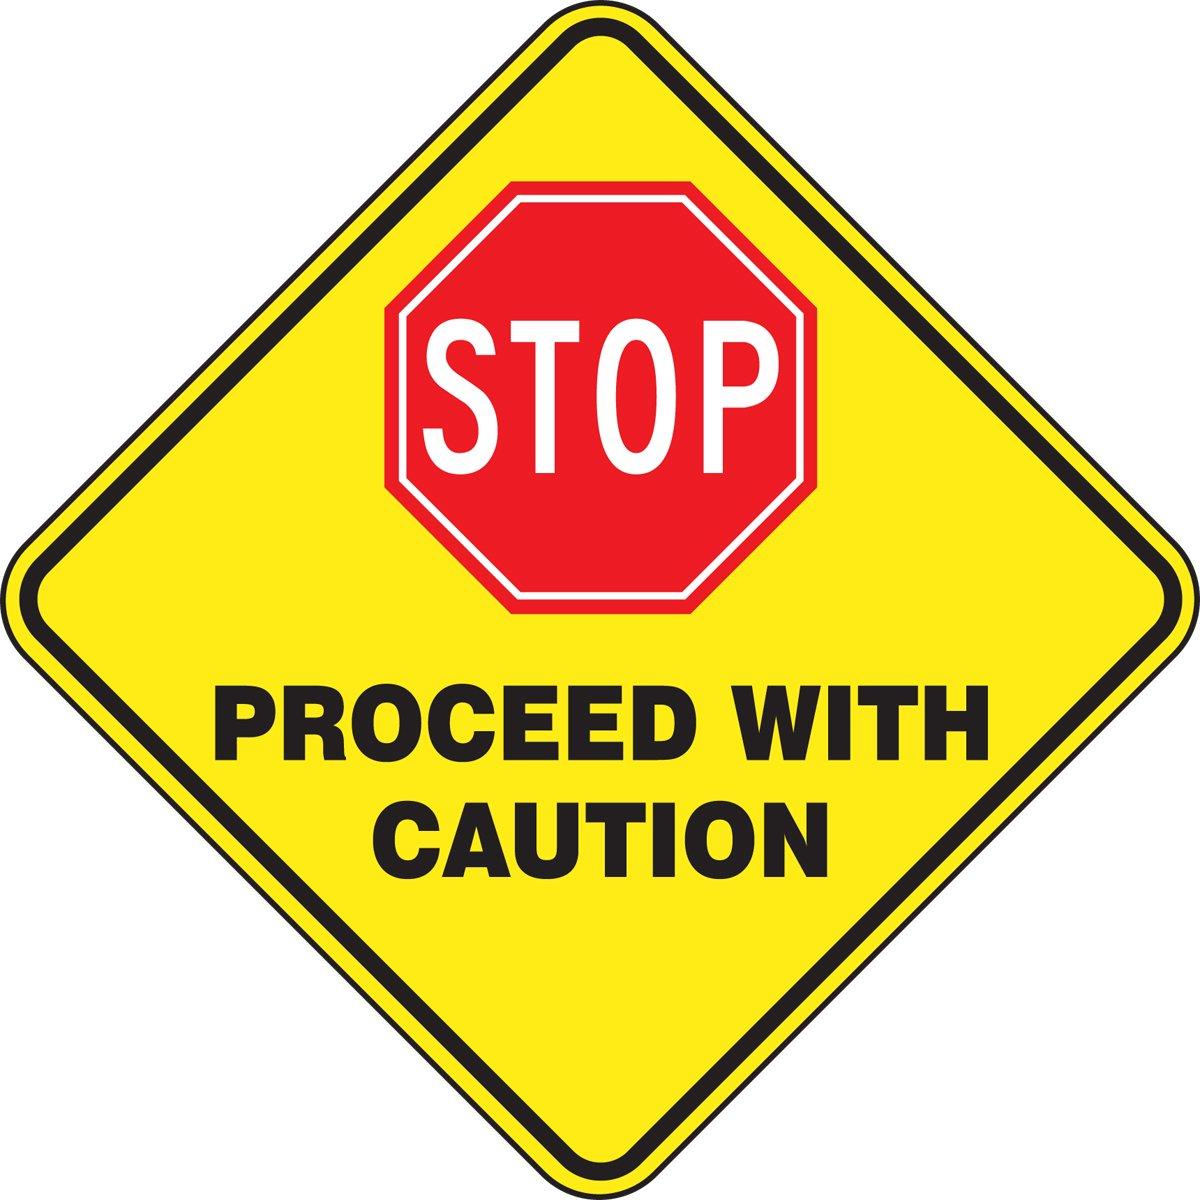 Buy Accuform Signs Mfs727 Slip Gard Adhesive Vinyl Round